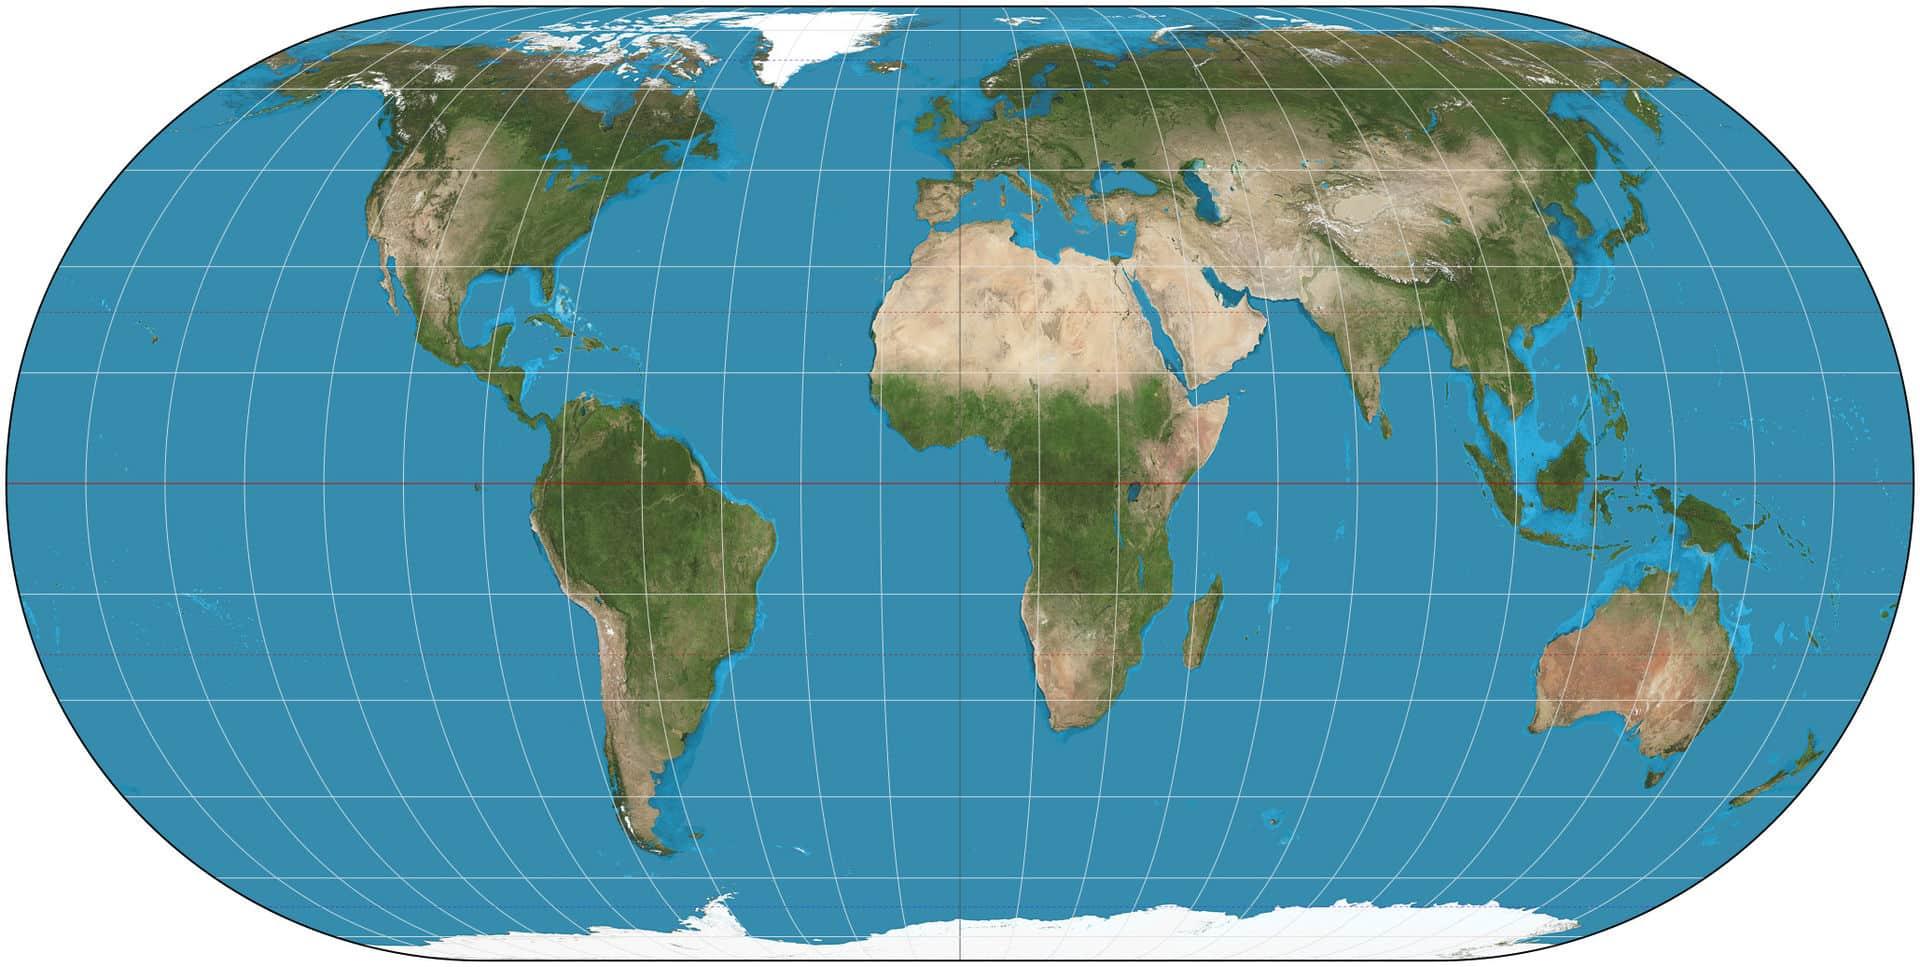 cartographie du monde Ecker IV